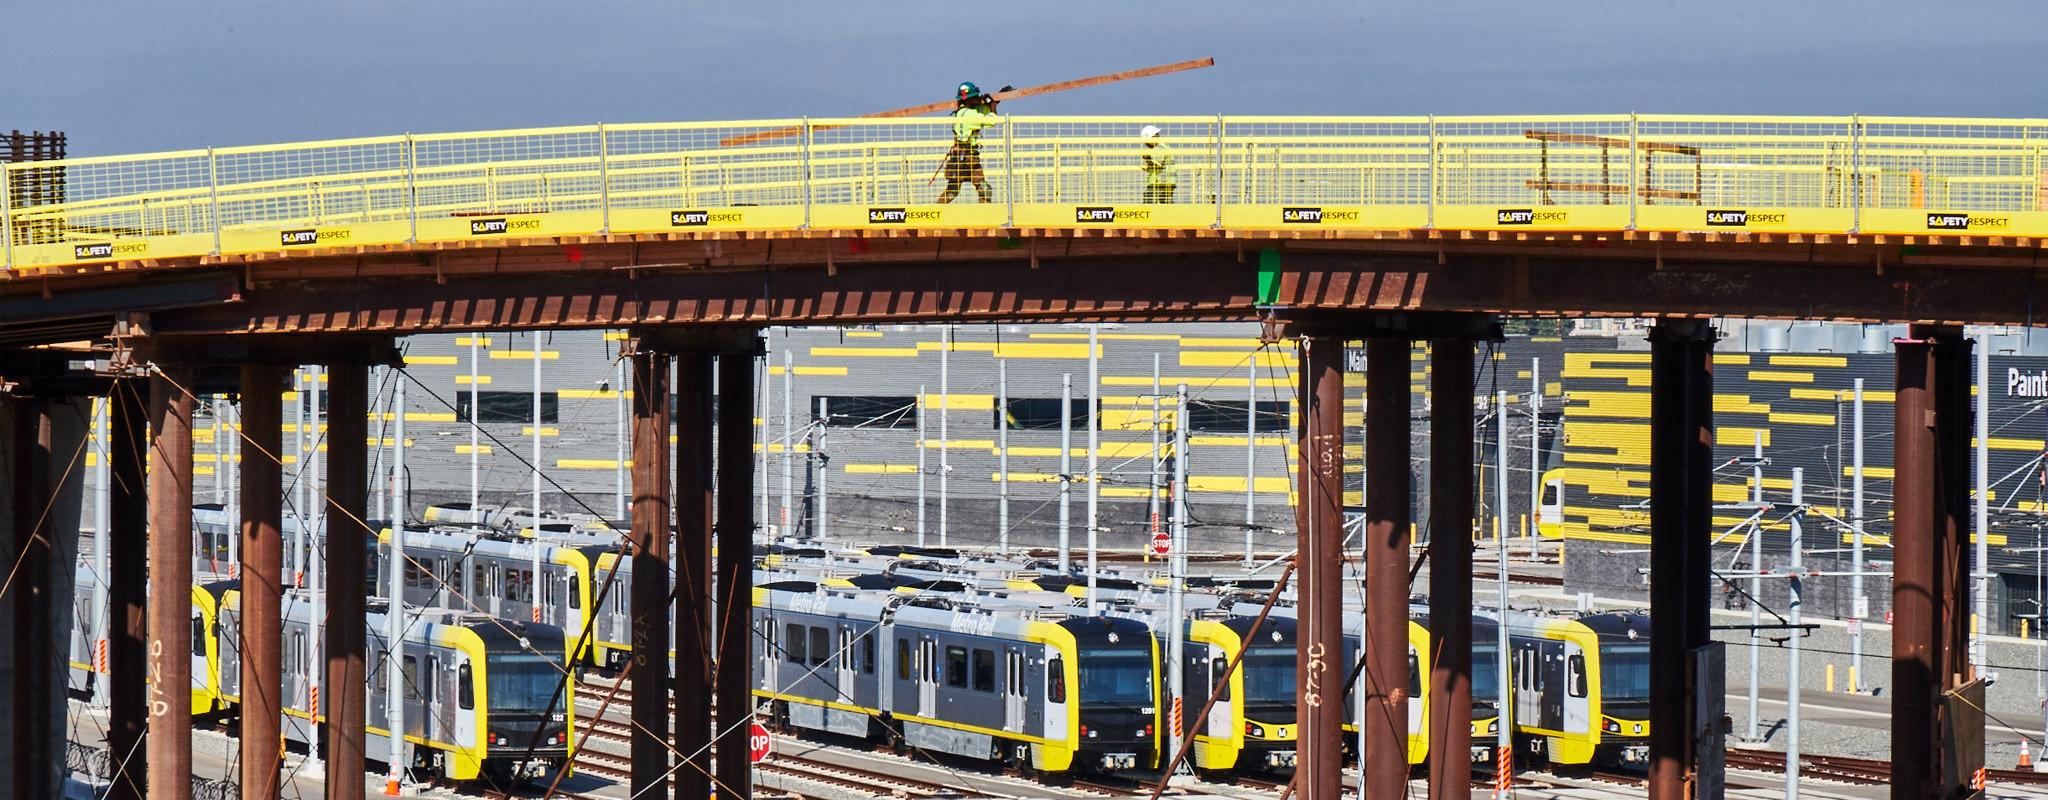 Metro trains and bridge construction